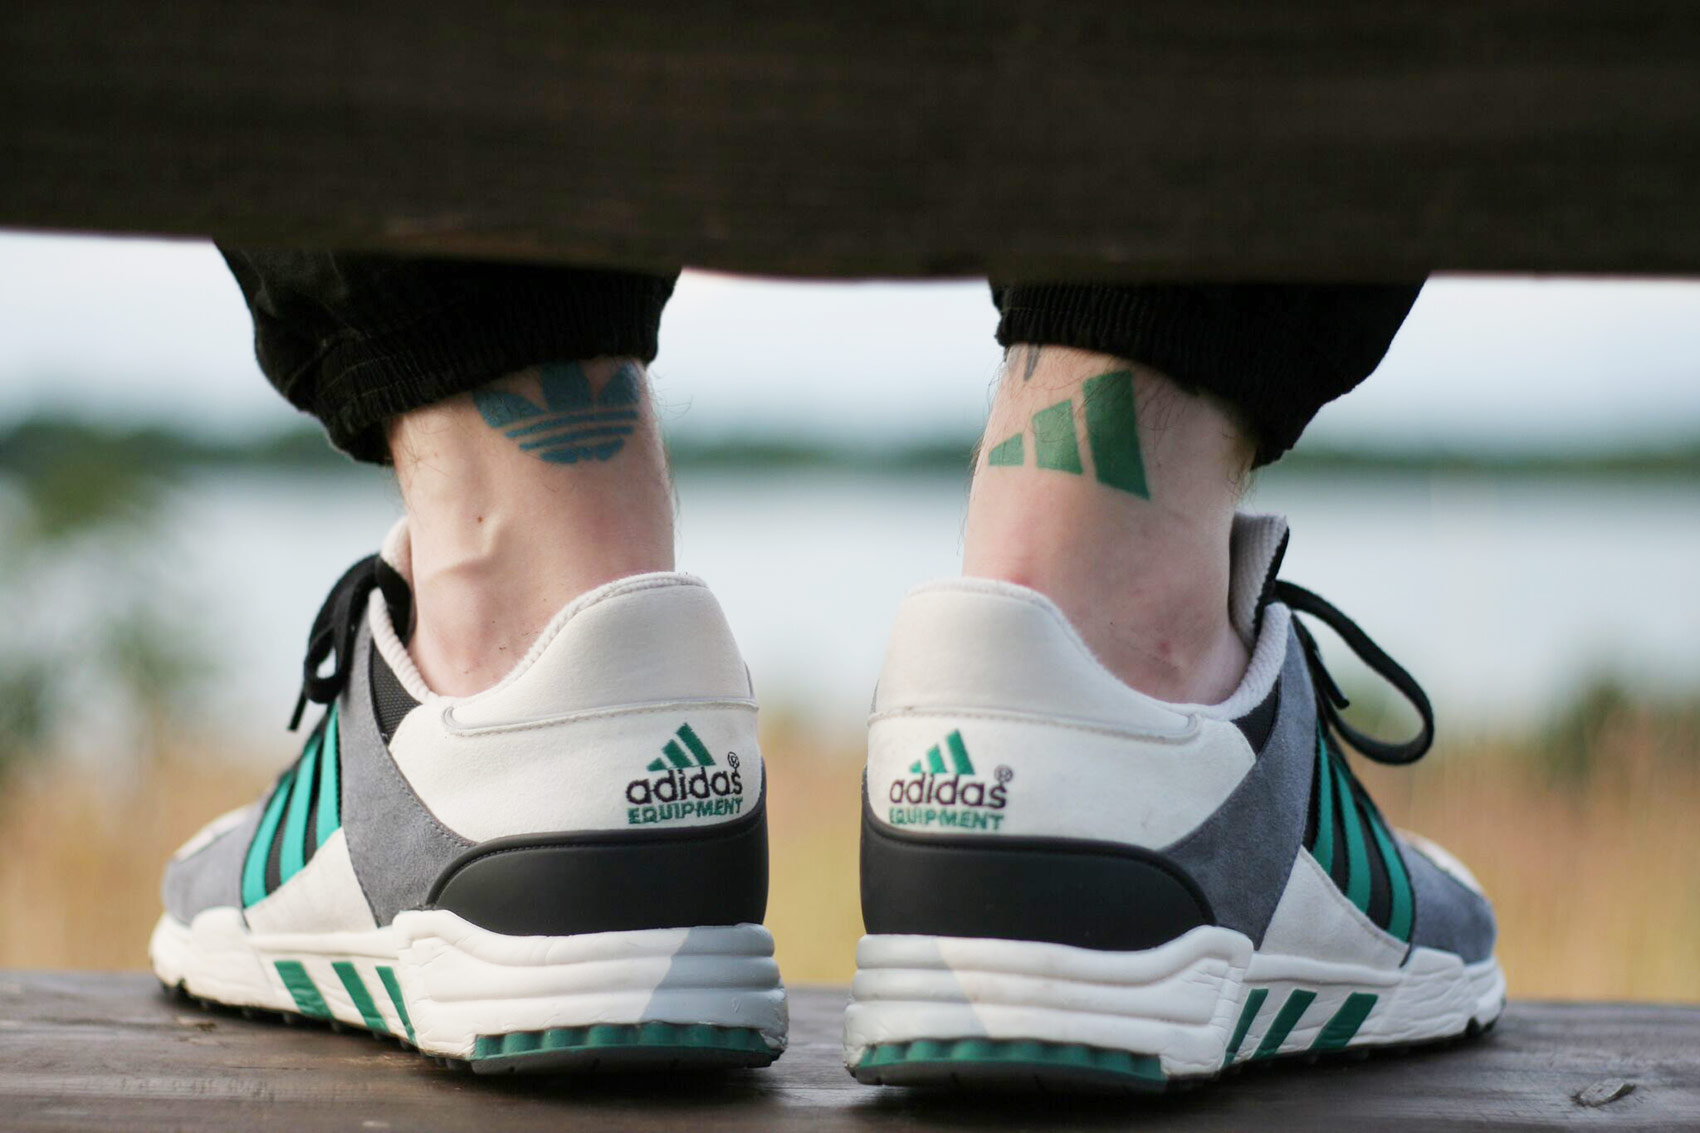 adidas-eqt-support-running-2